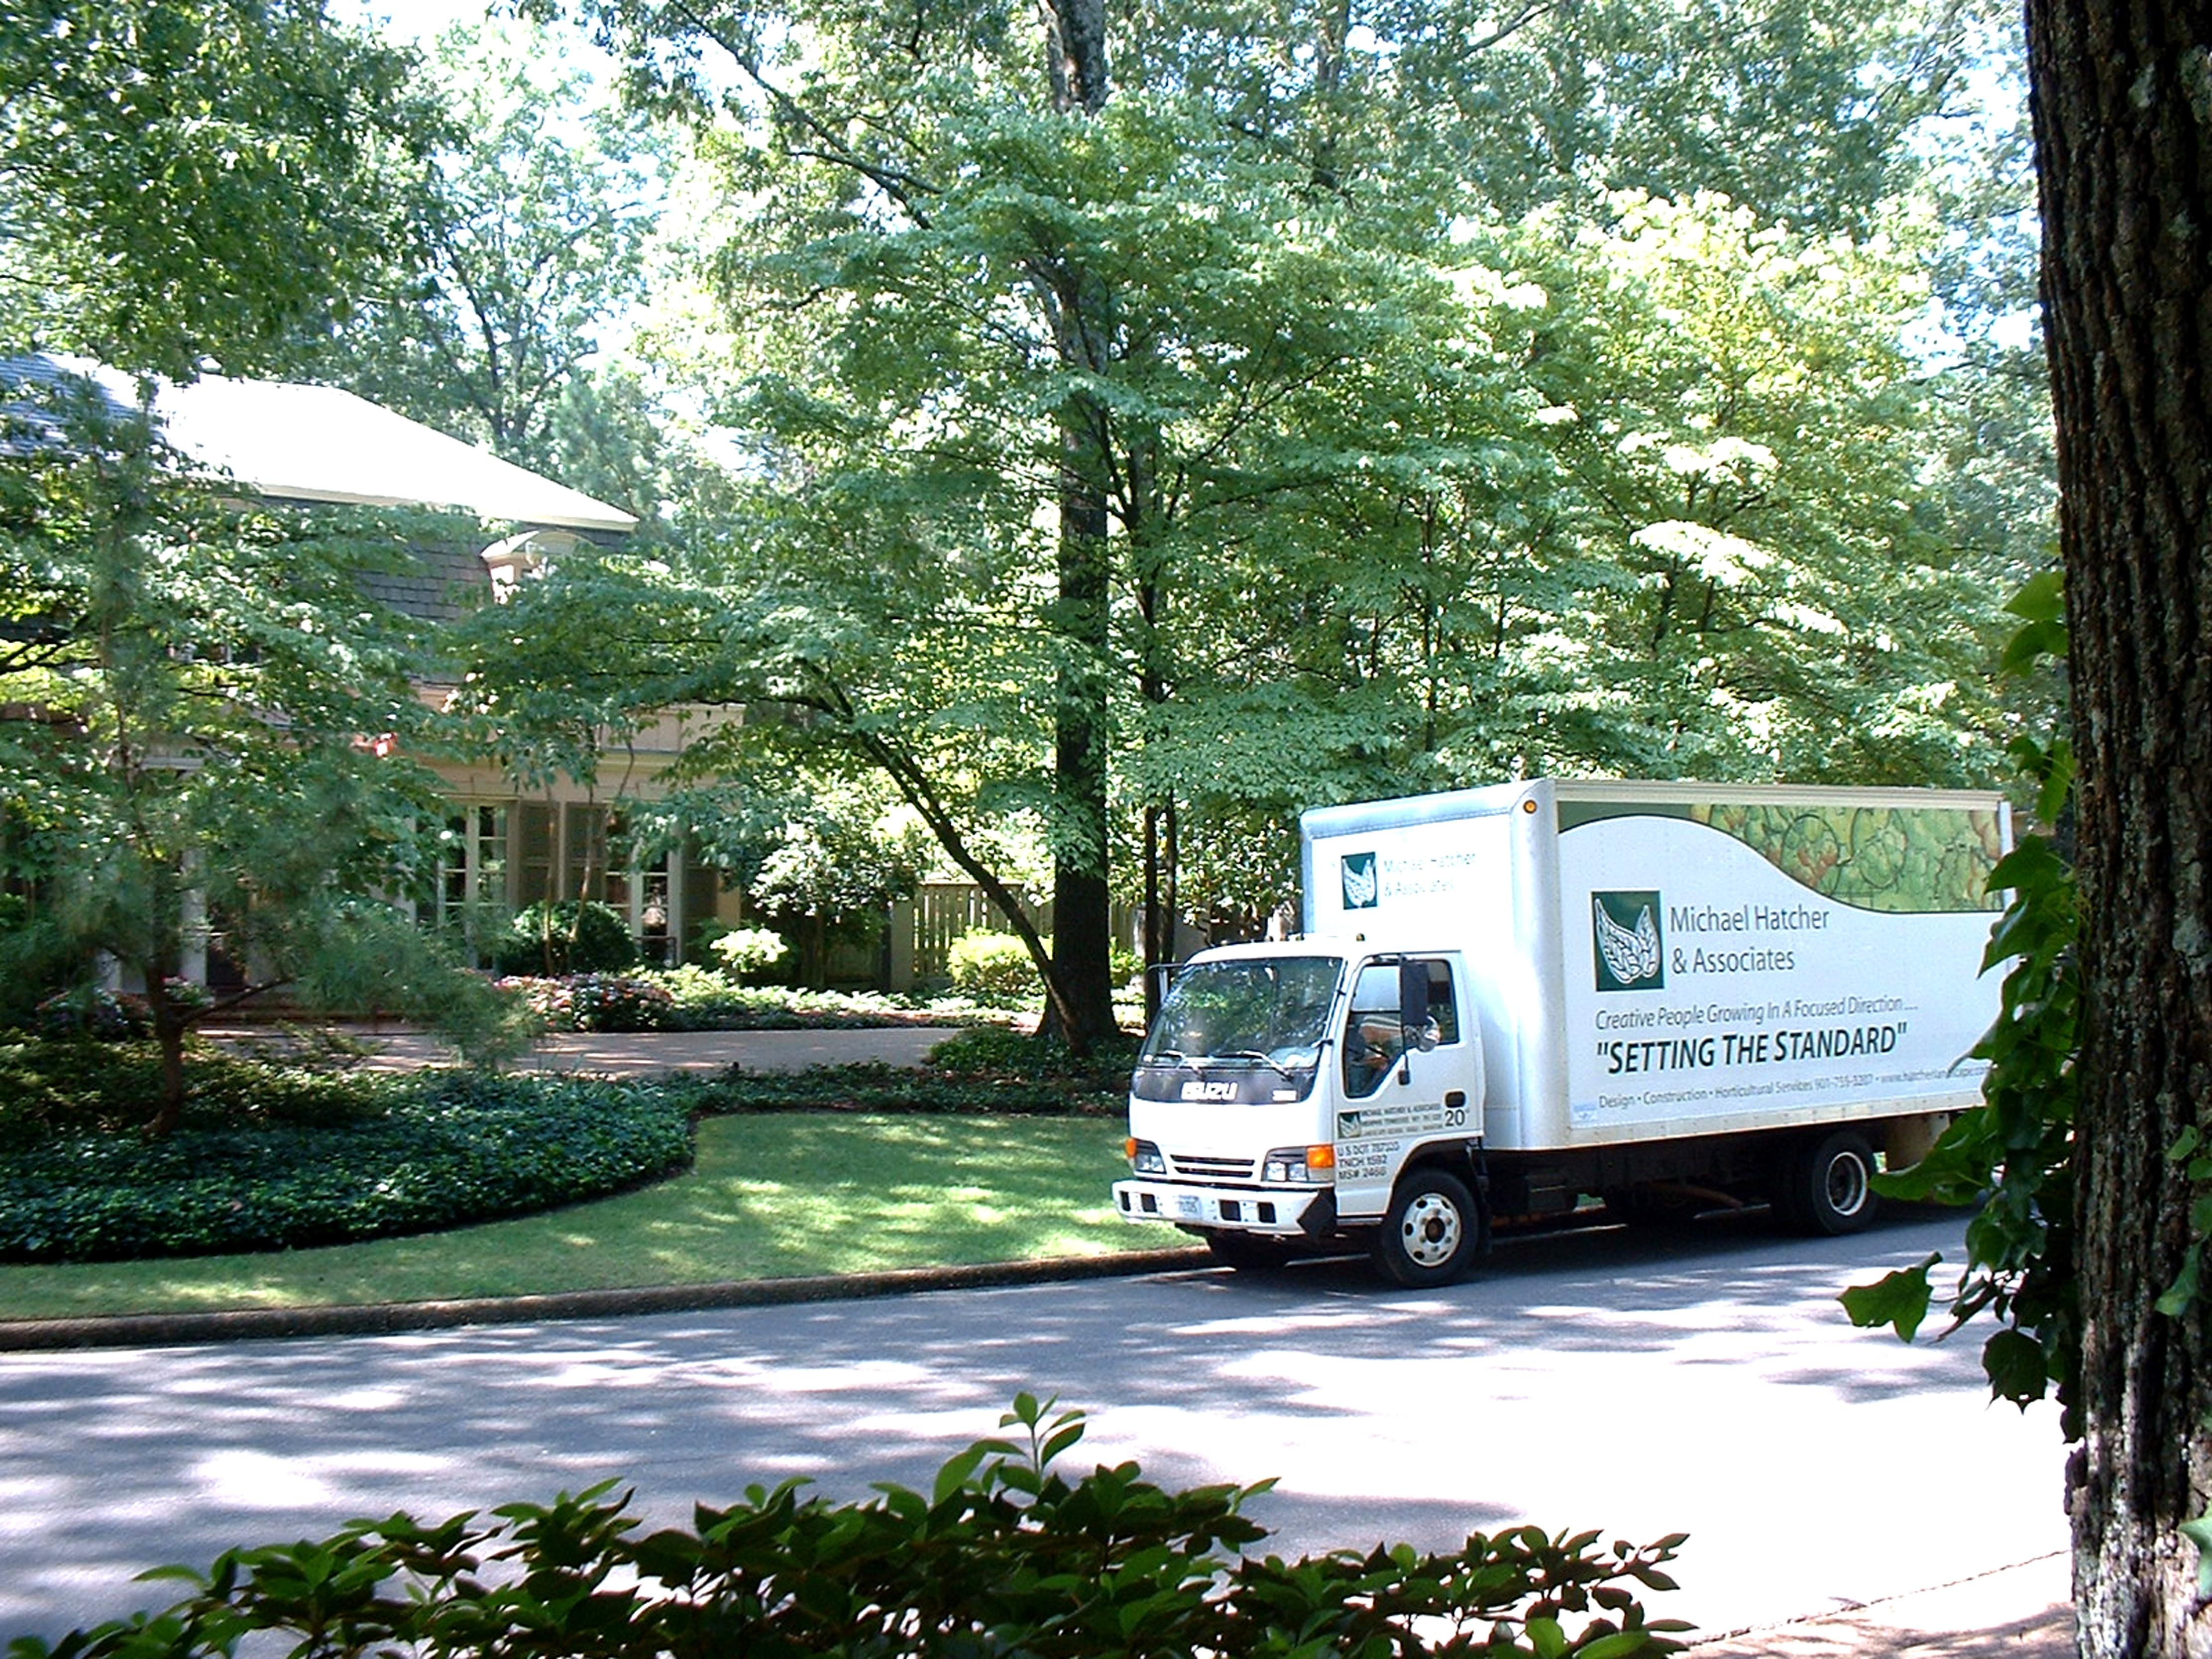 Michael Hatcher team providing lawn care services to a client in Memphis, TN